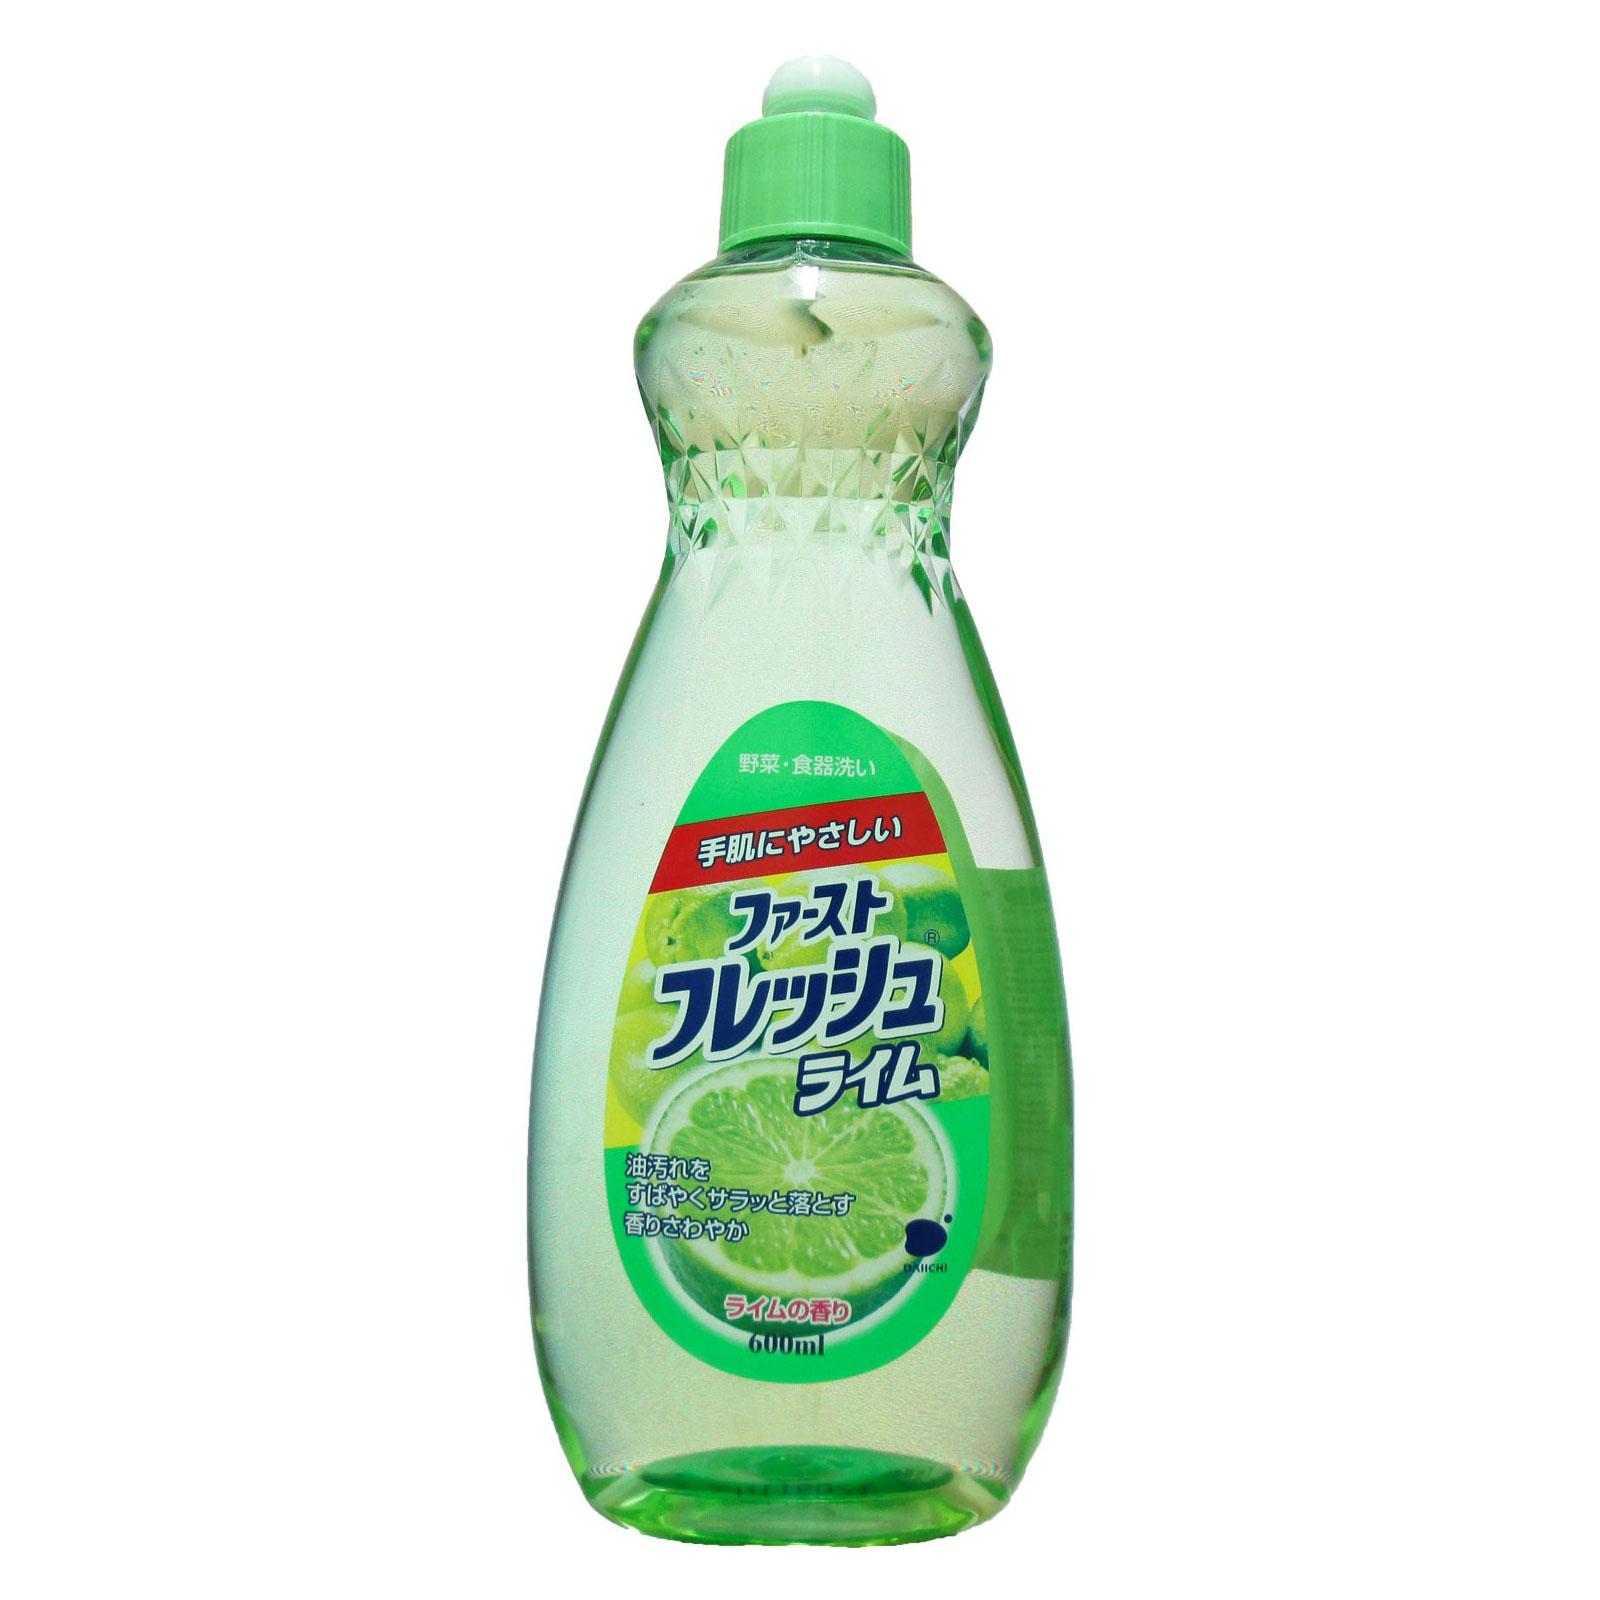 Жидкое средство Daiichi Даичи для мытья посуды 600 мл Лайм<br>